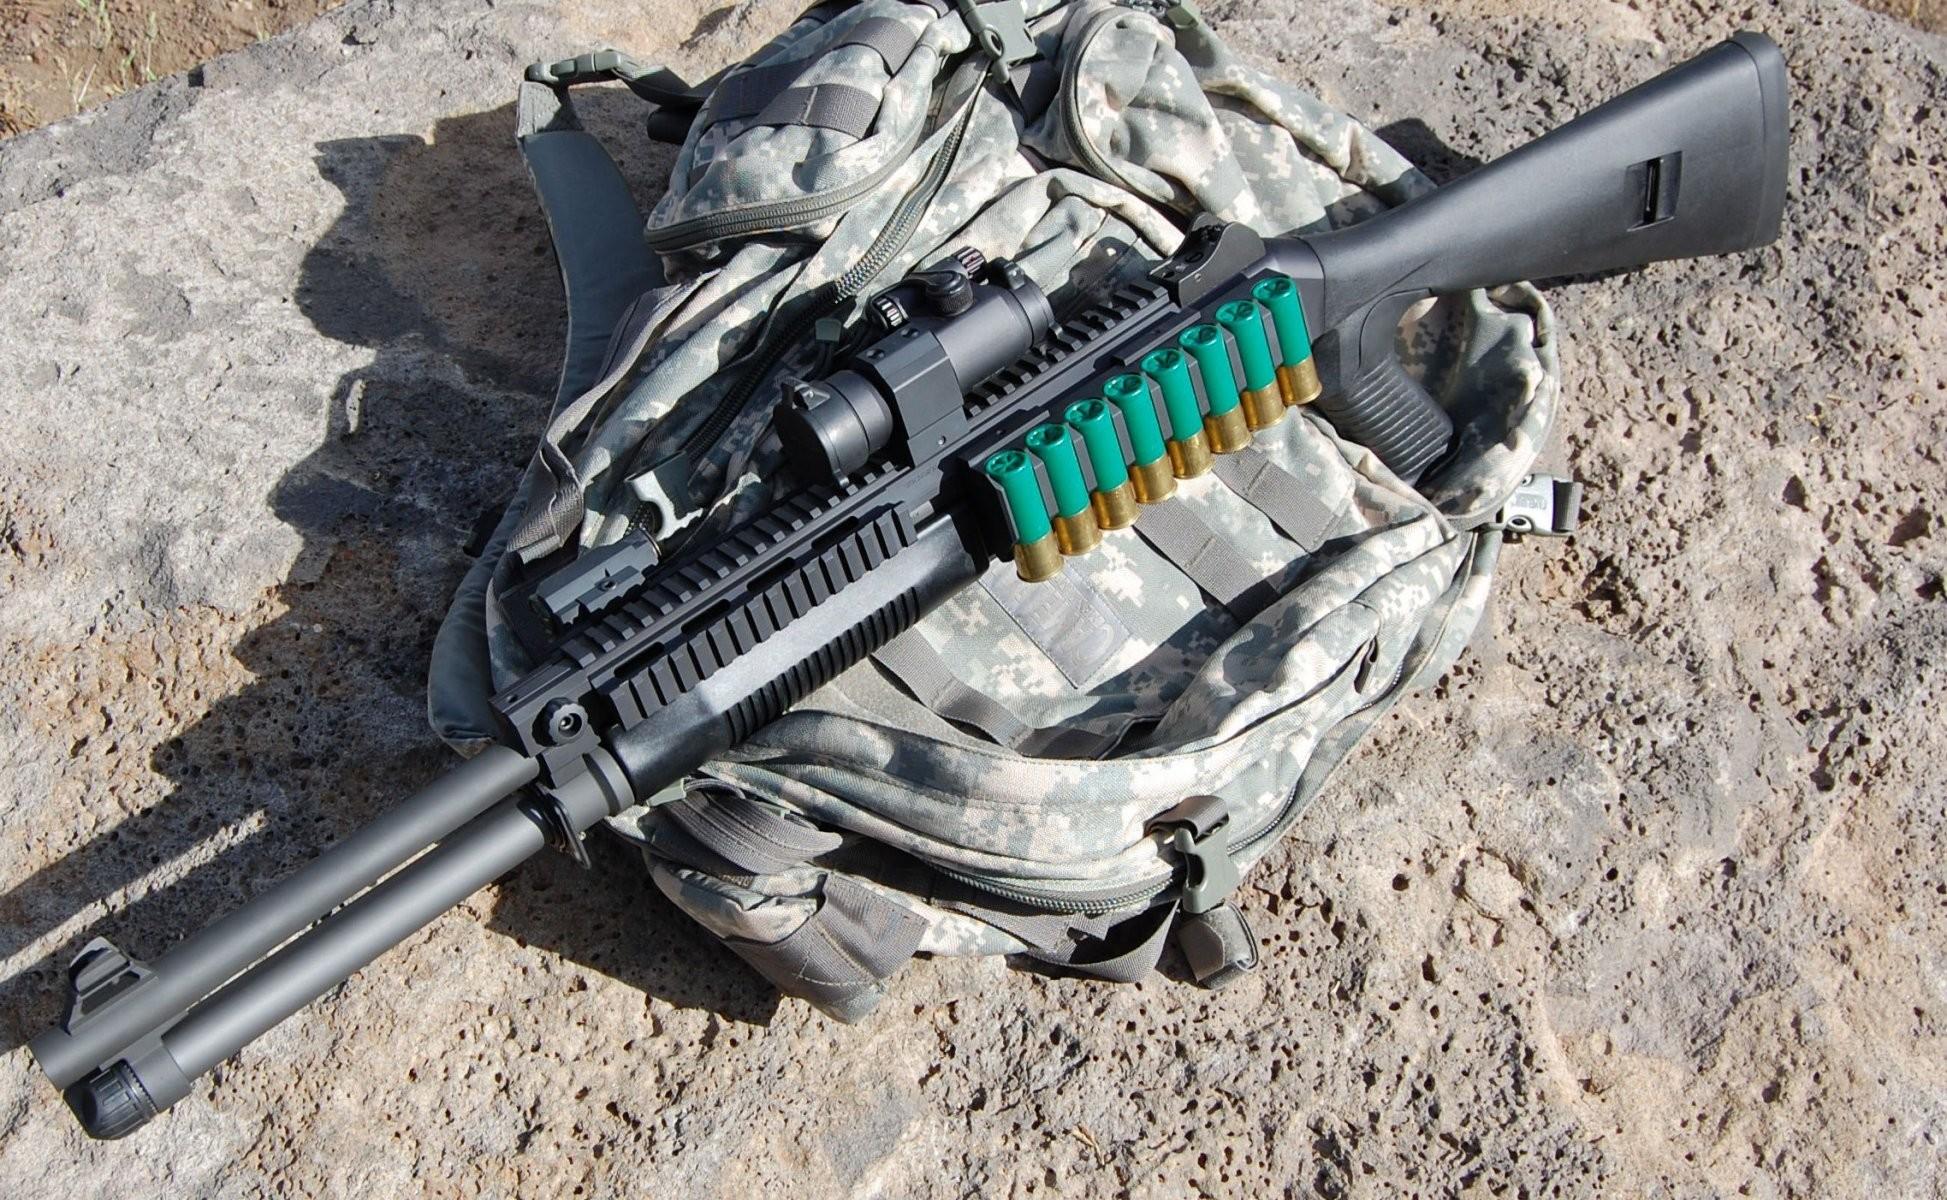 benelli m4 super 90 m1014 gun weapons acu army combat uniform wallpapers  benelli m4 super 90